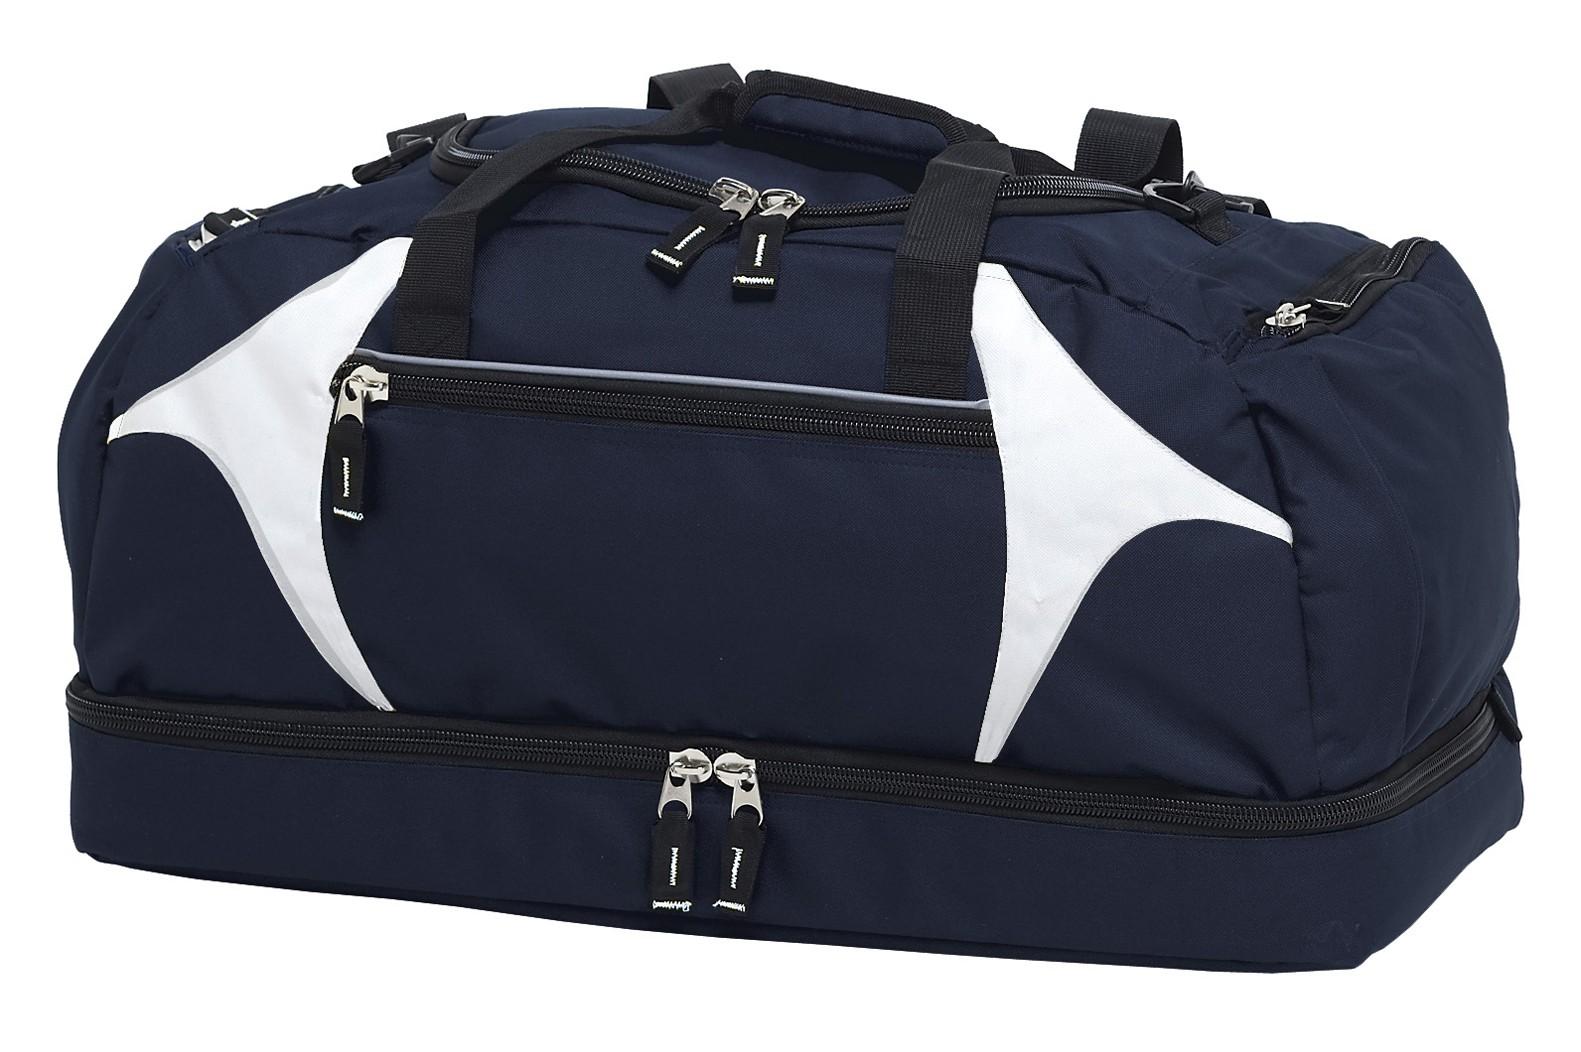 Spliced Zenith Sports Bag - Navy & White